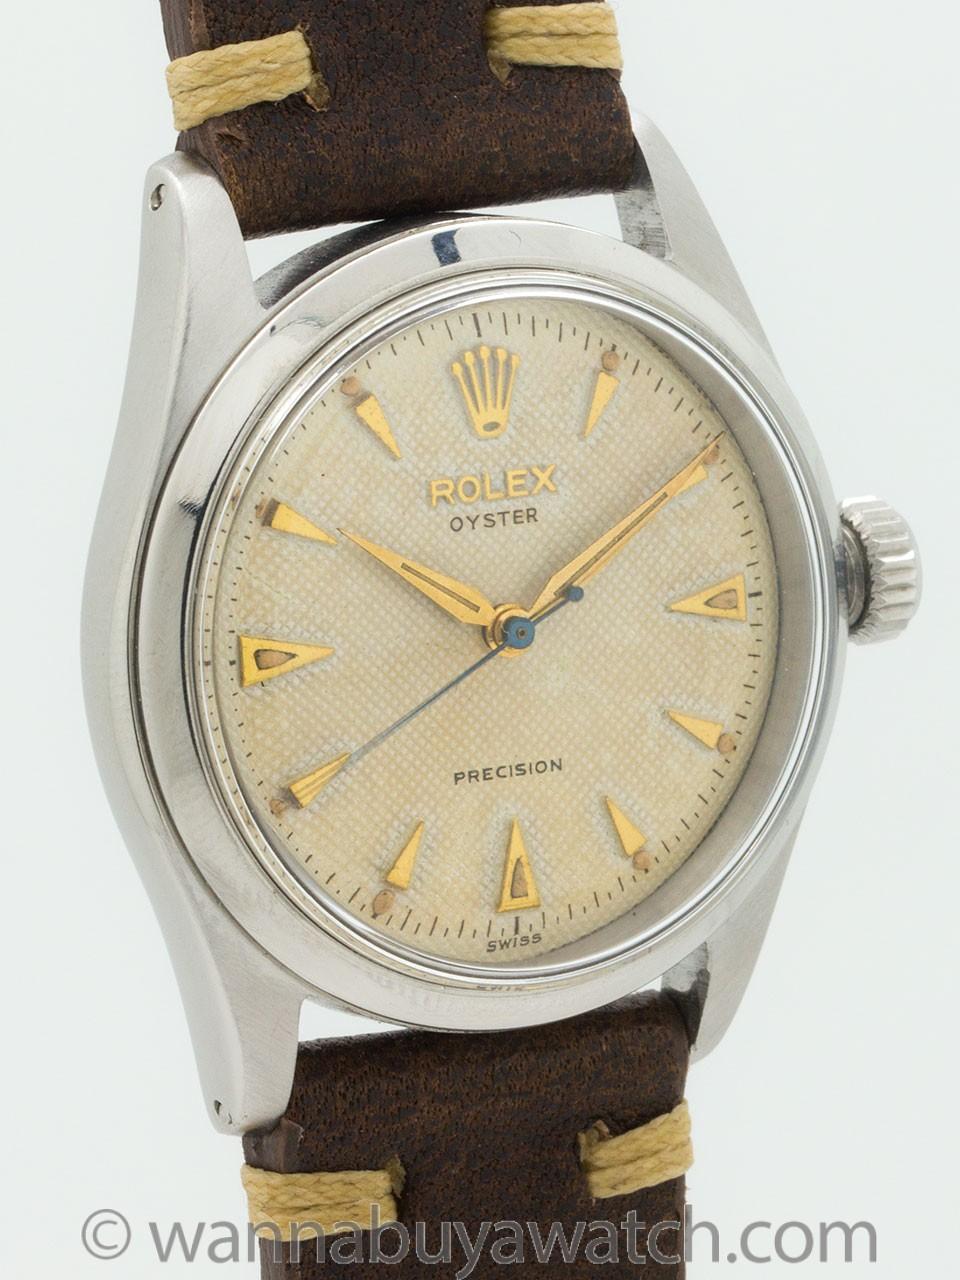 rolex oyster precision ref 6282 original waffle dial circa 1955 wanna buy a watch. Black Bedroom Furniture Sets. Home Design Ideas